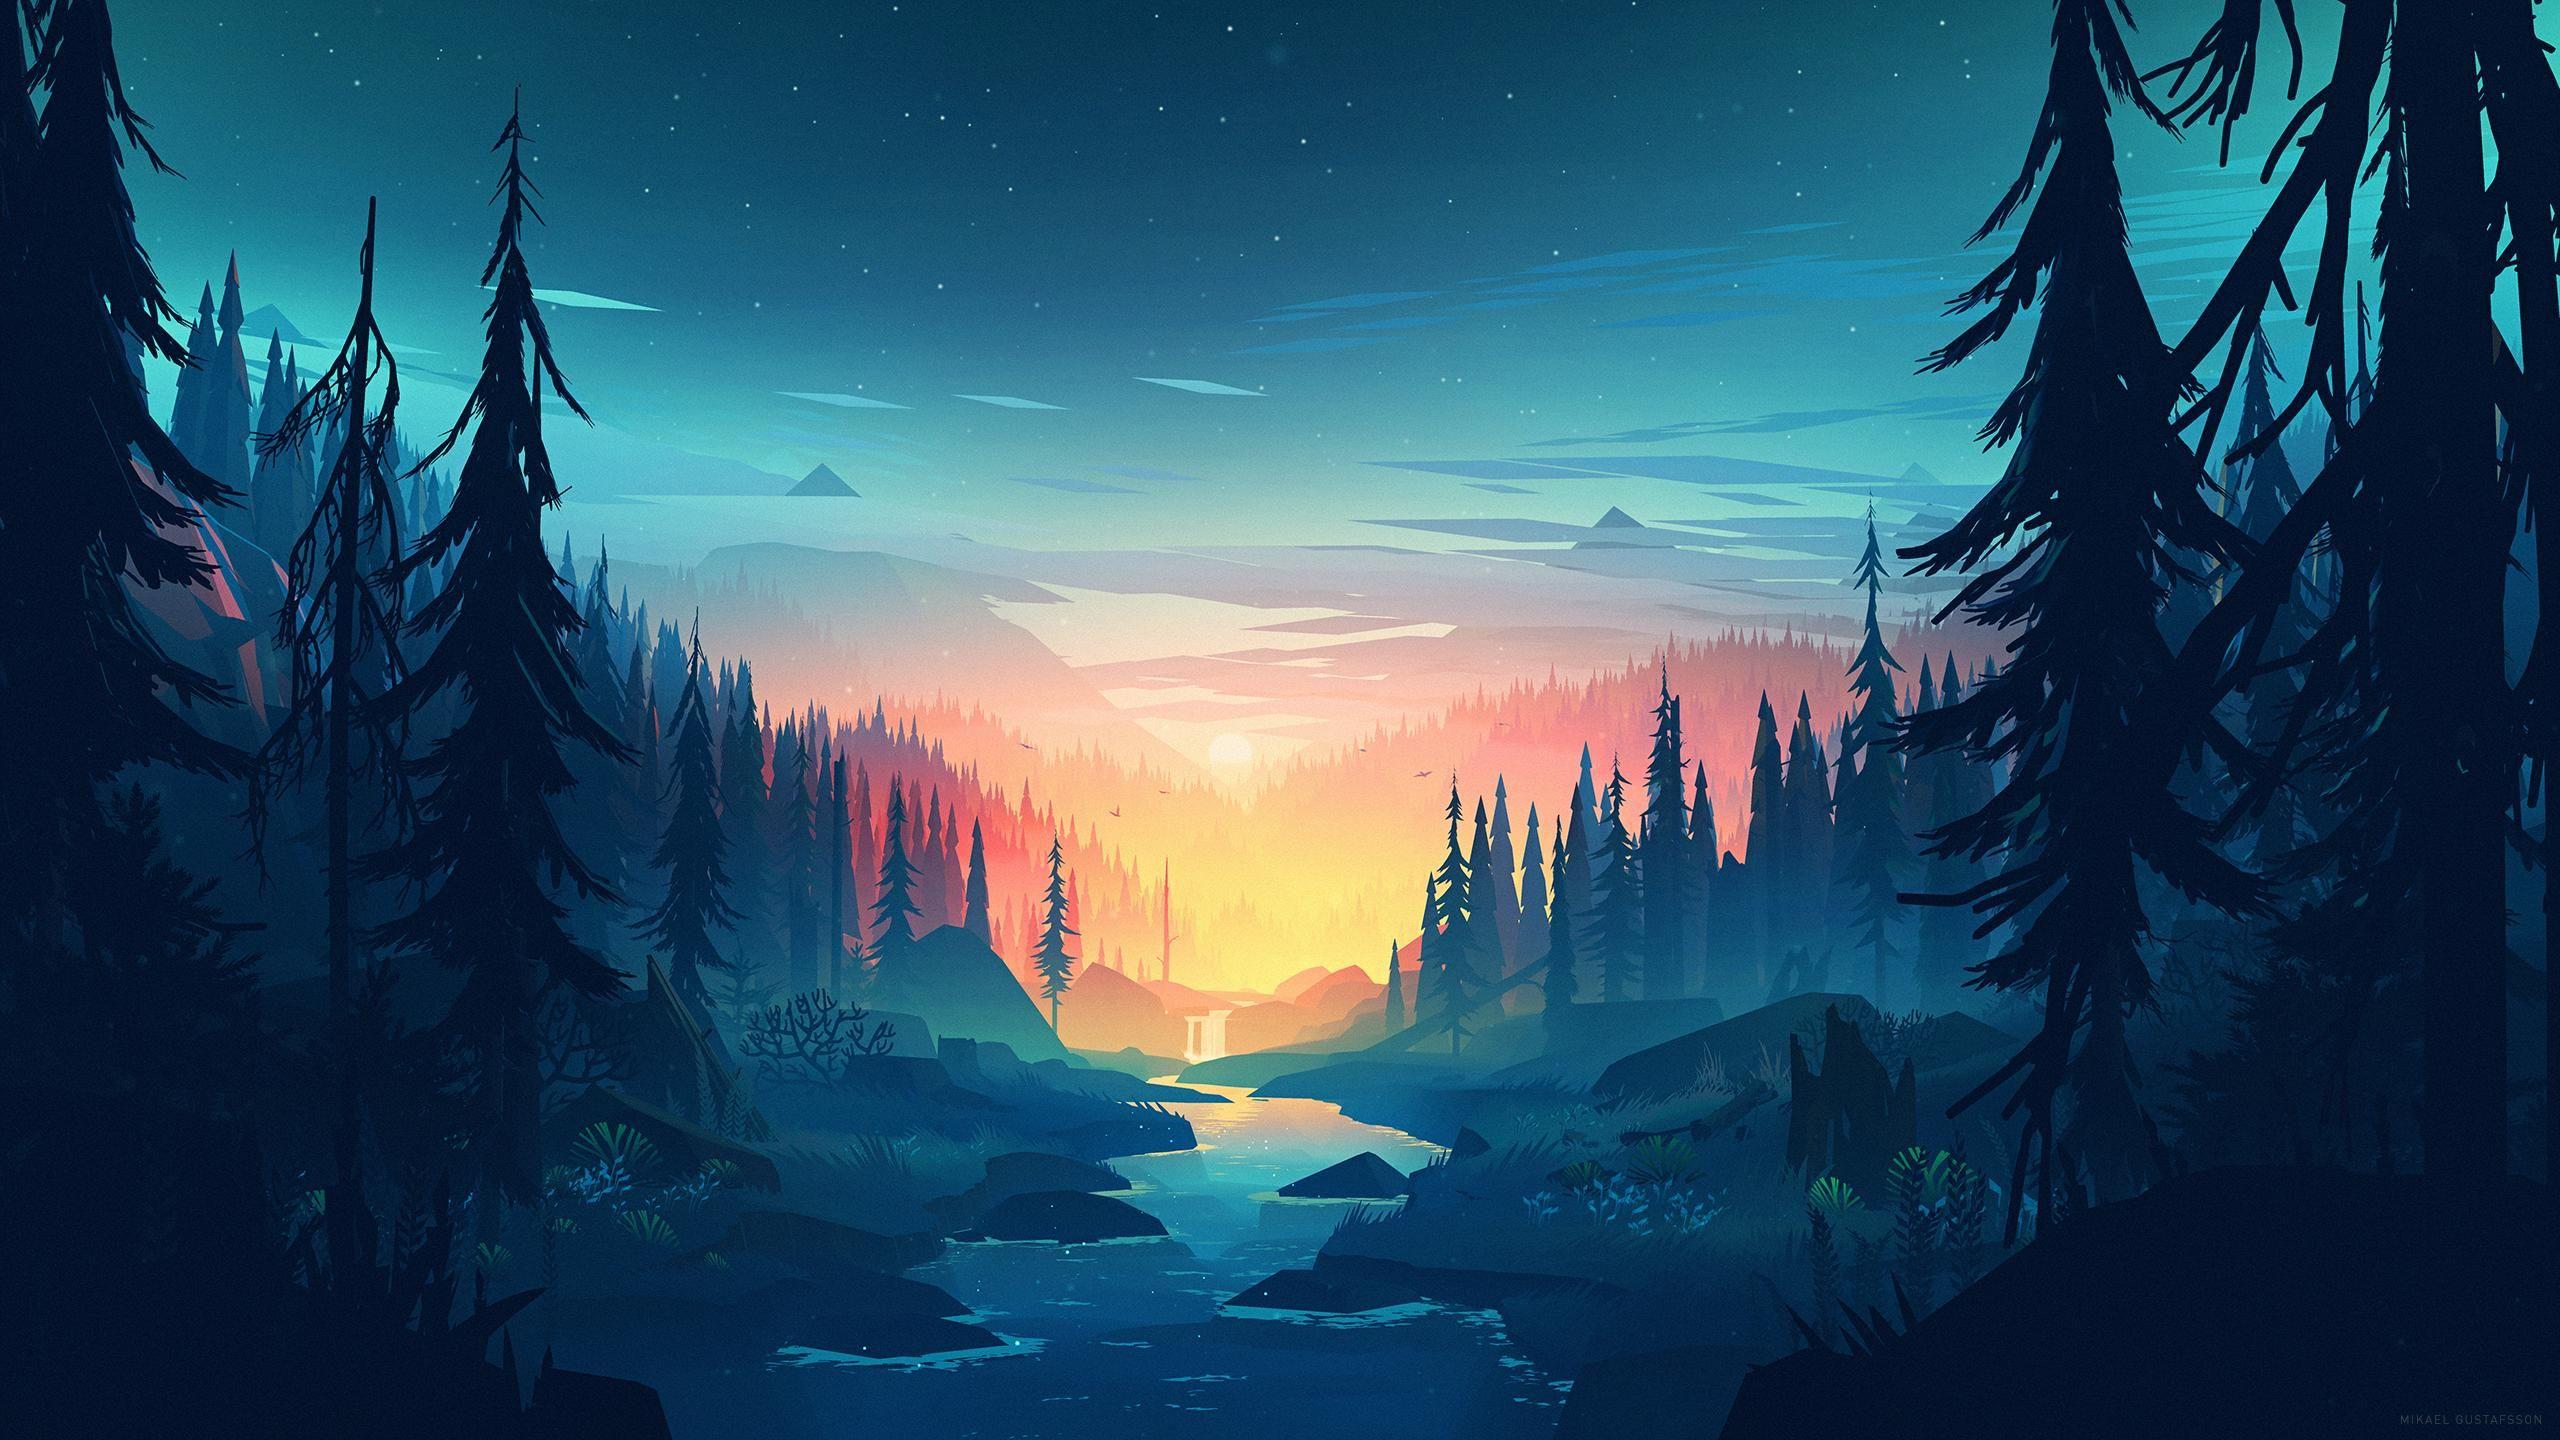 Insane Sunset Environment Wallpaper By Mikael Gustaffson Desktop Wallpaper Art Landscape Wallpaper Minimalist Wallpaper